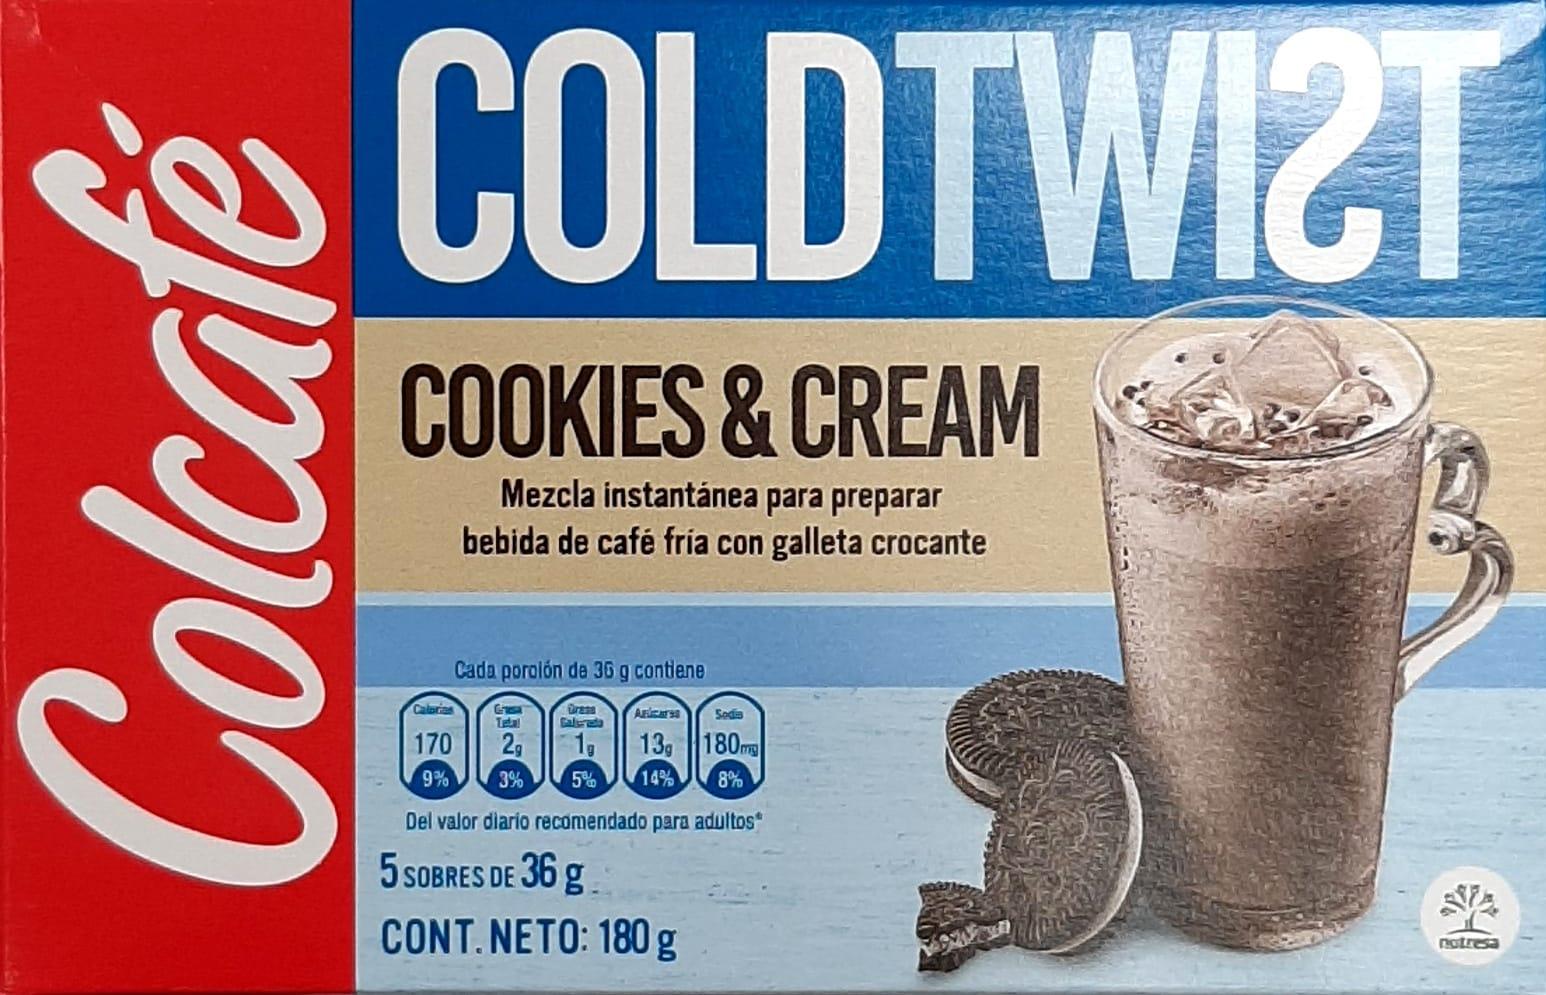 Colcafe Cold Twist Cookies & Cream x5u 180g